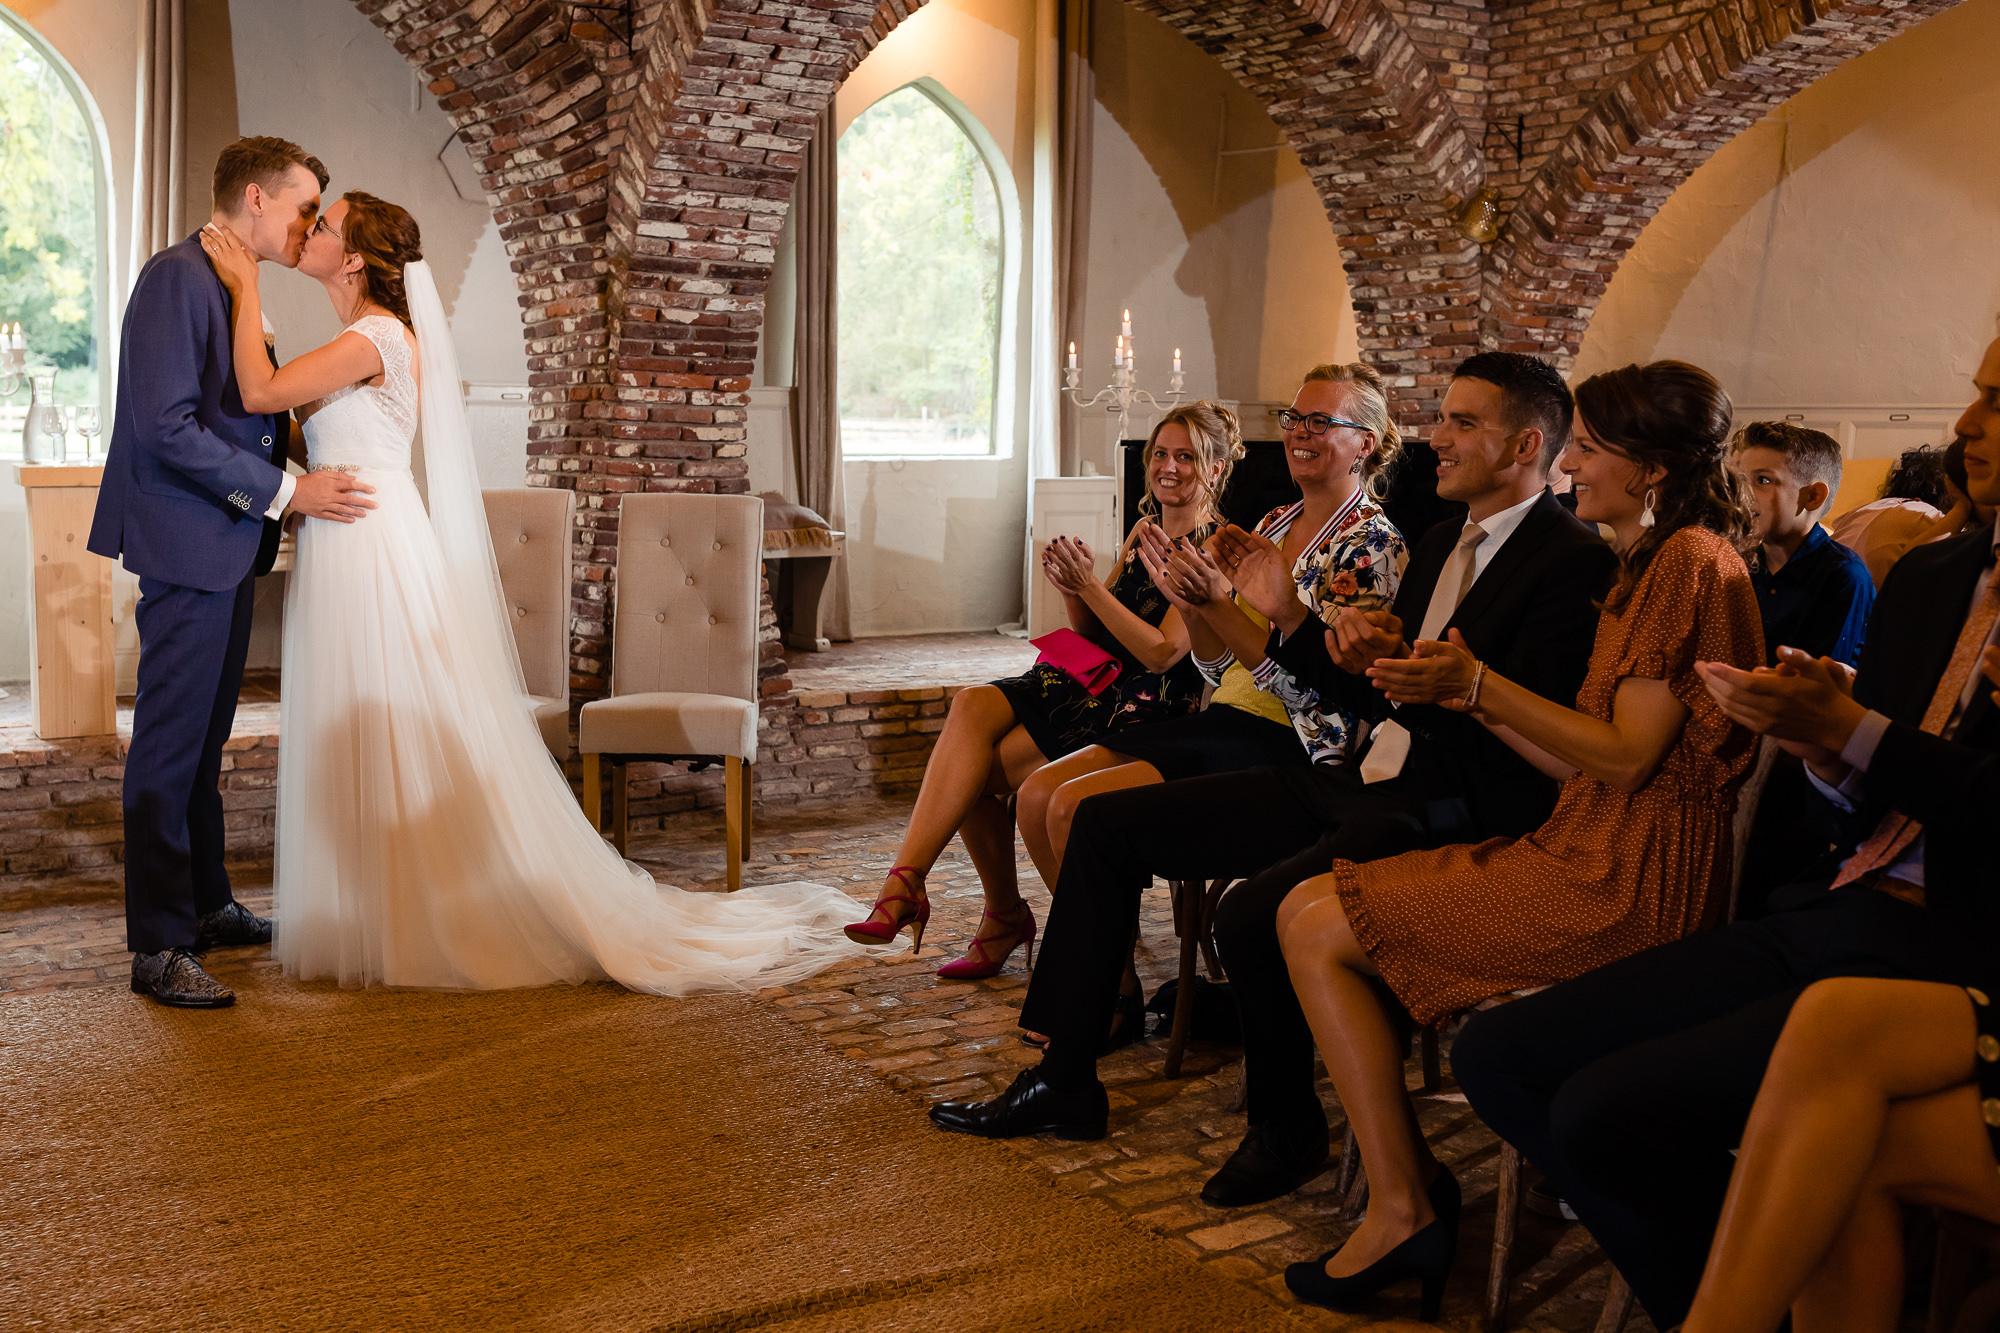 Bruidspaar kust na het jawoord tegenover vrienden en familie